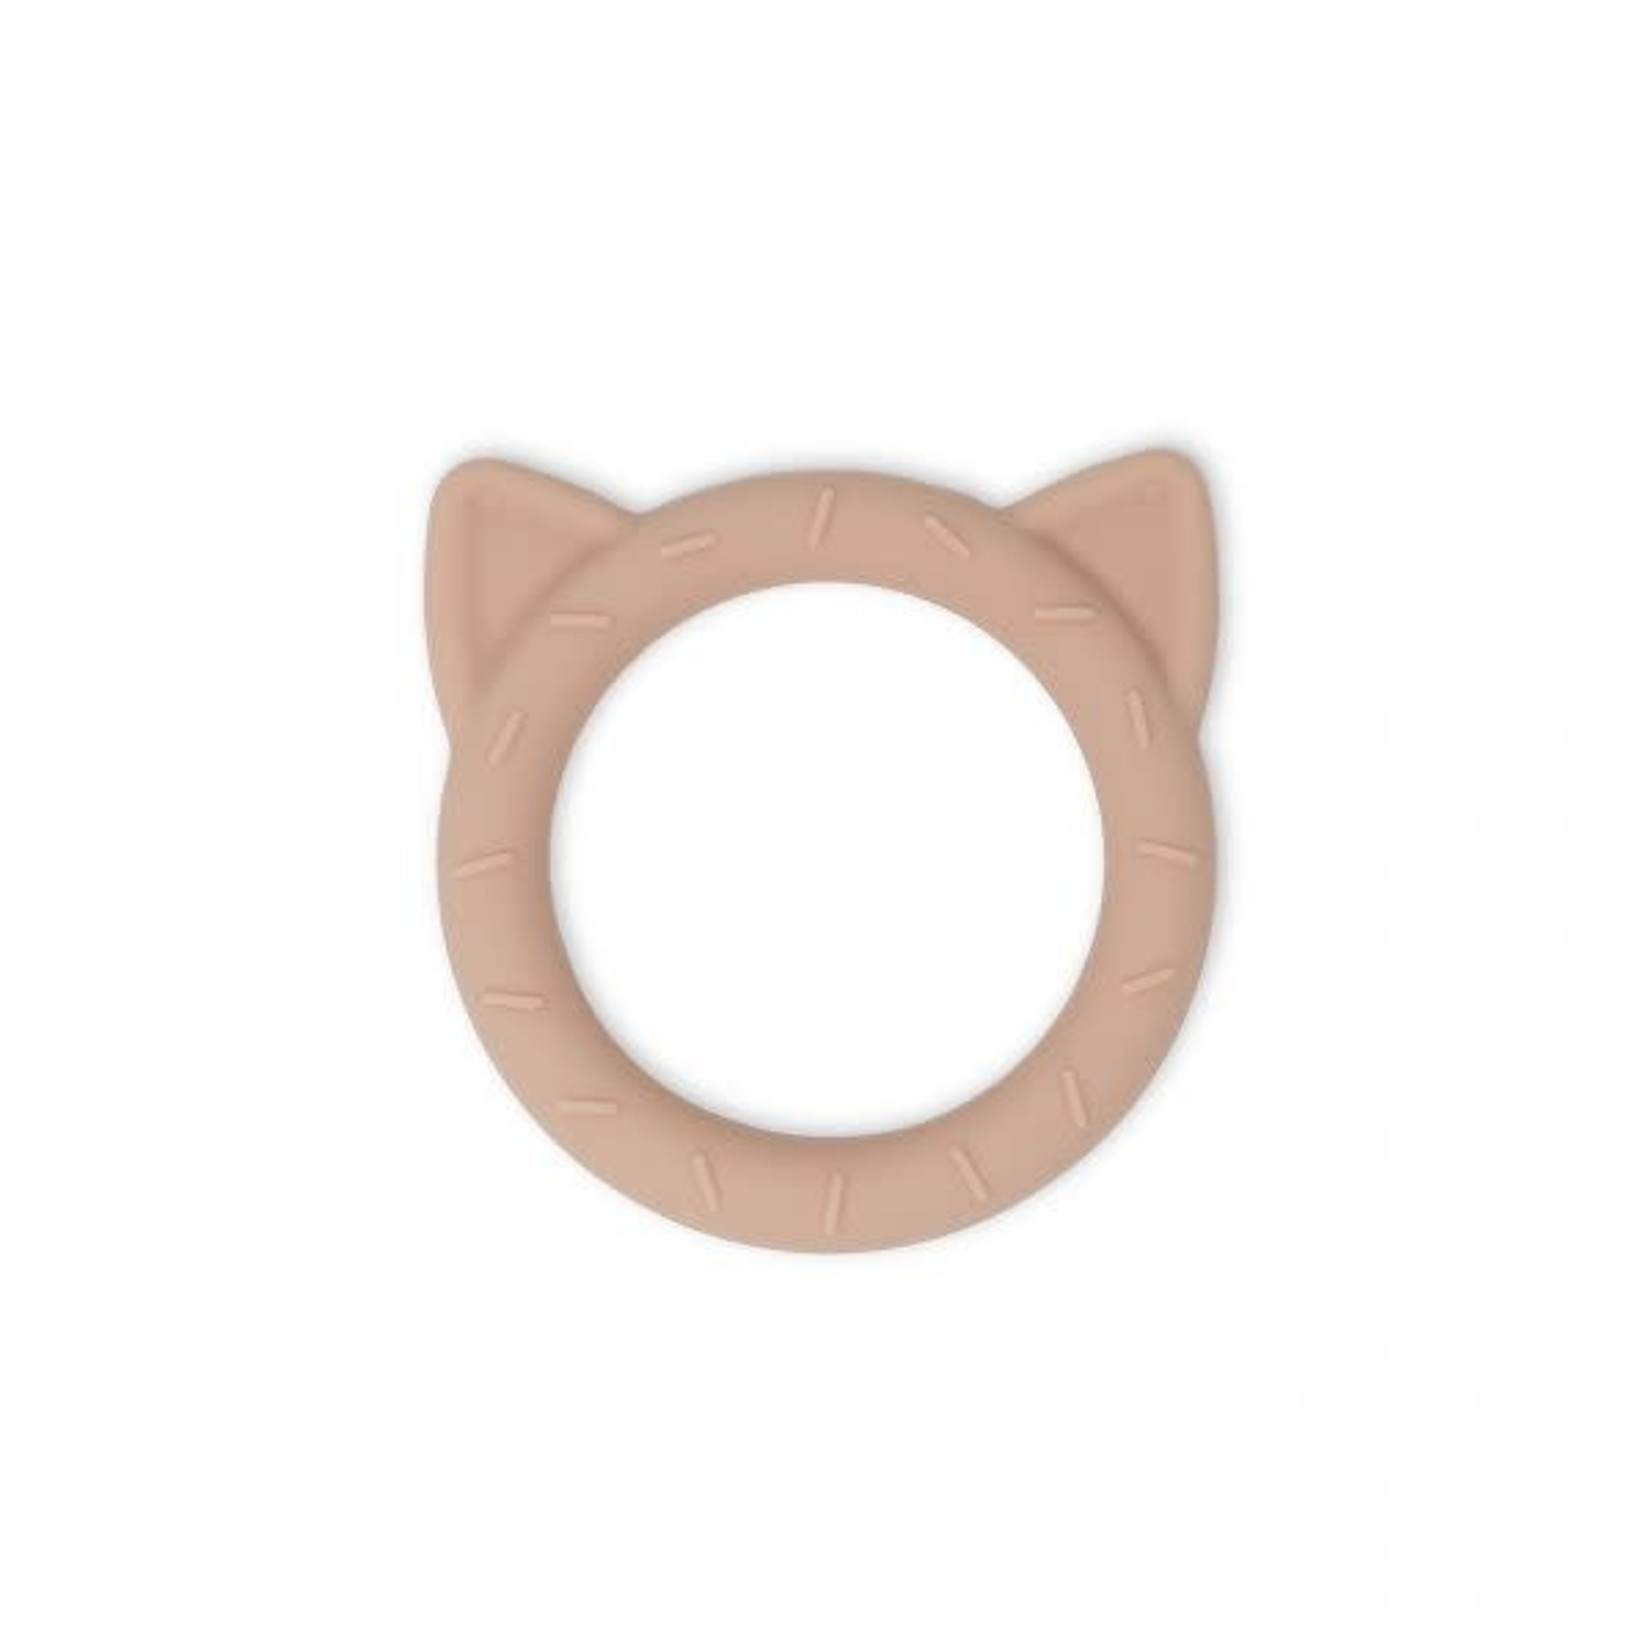 Cat Teether - Blush